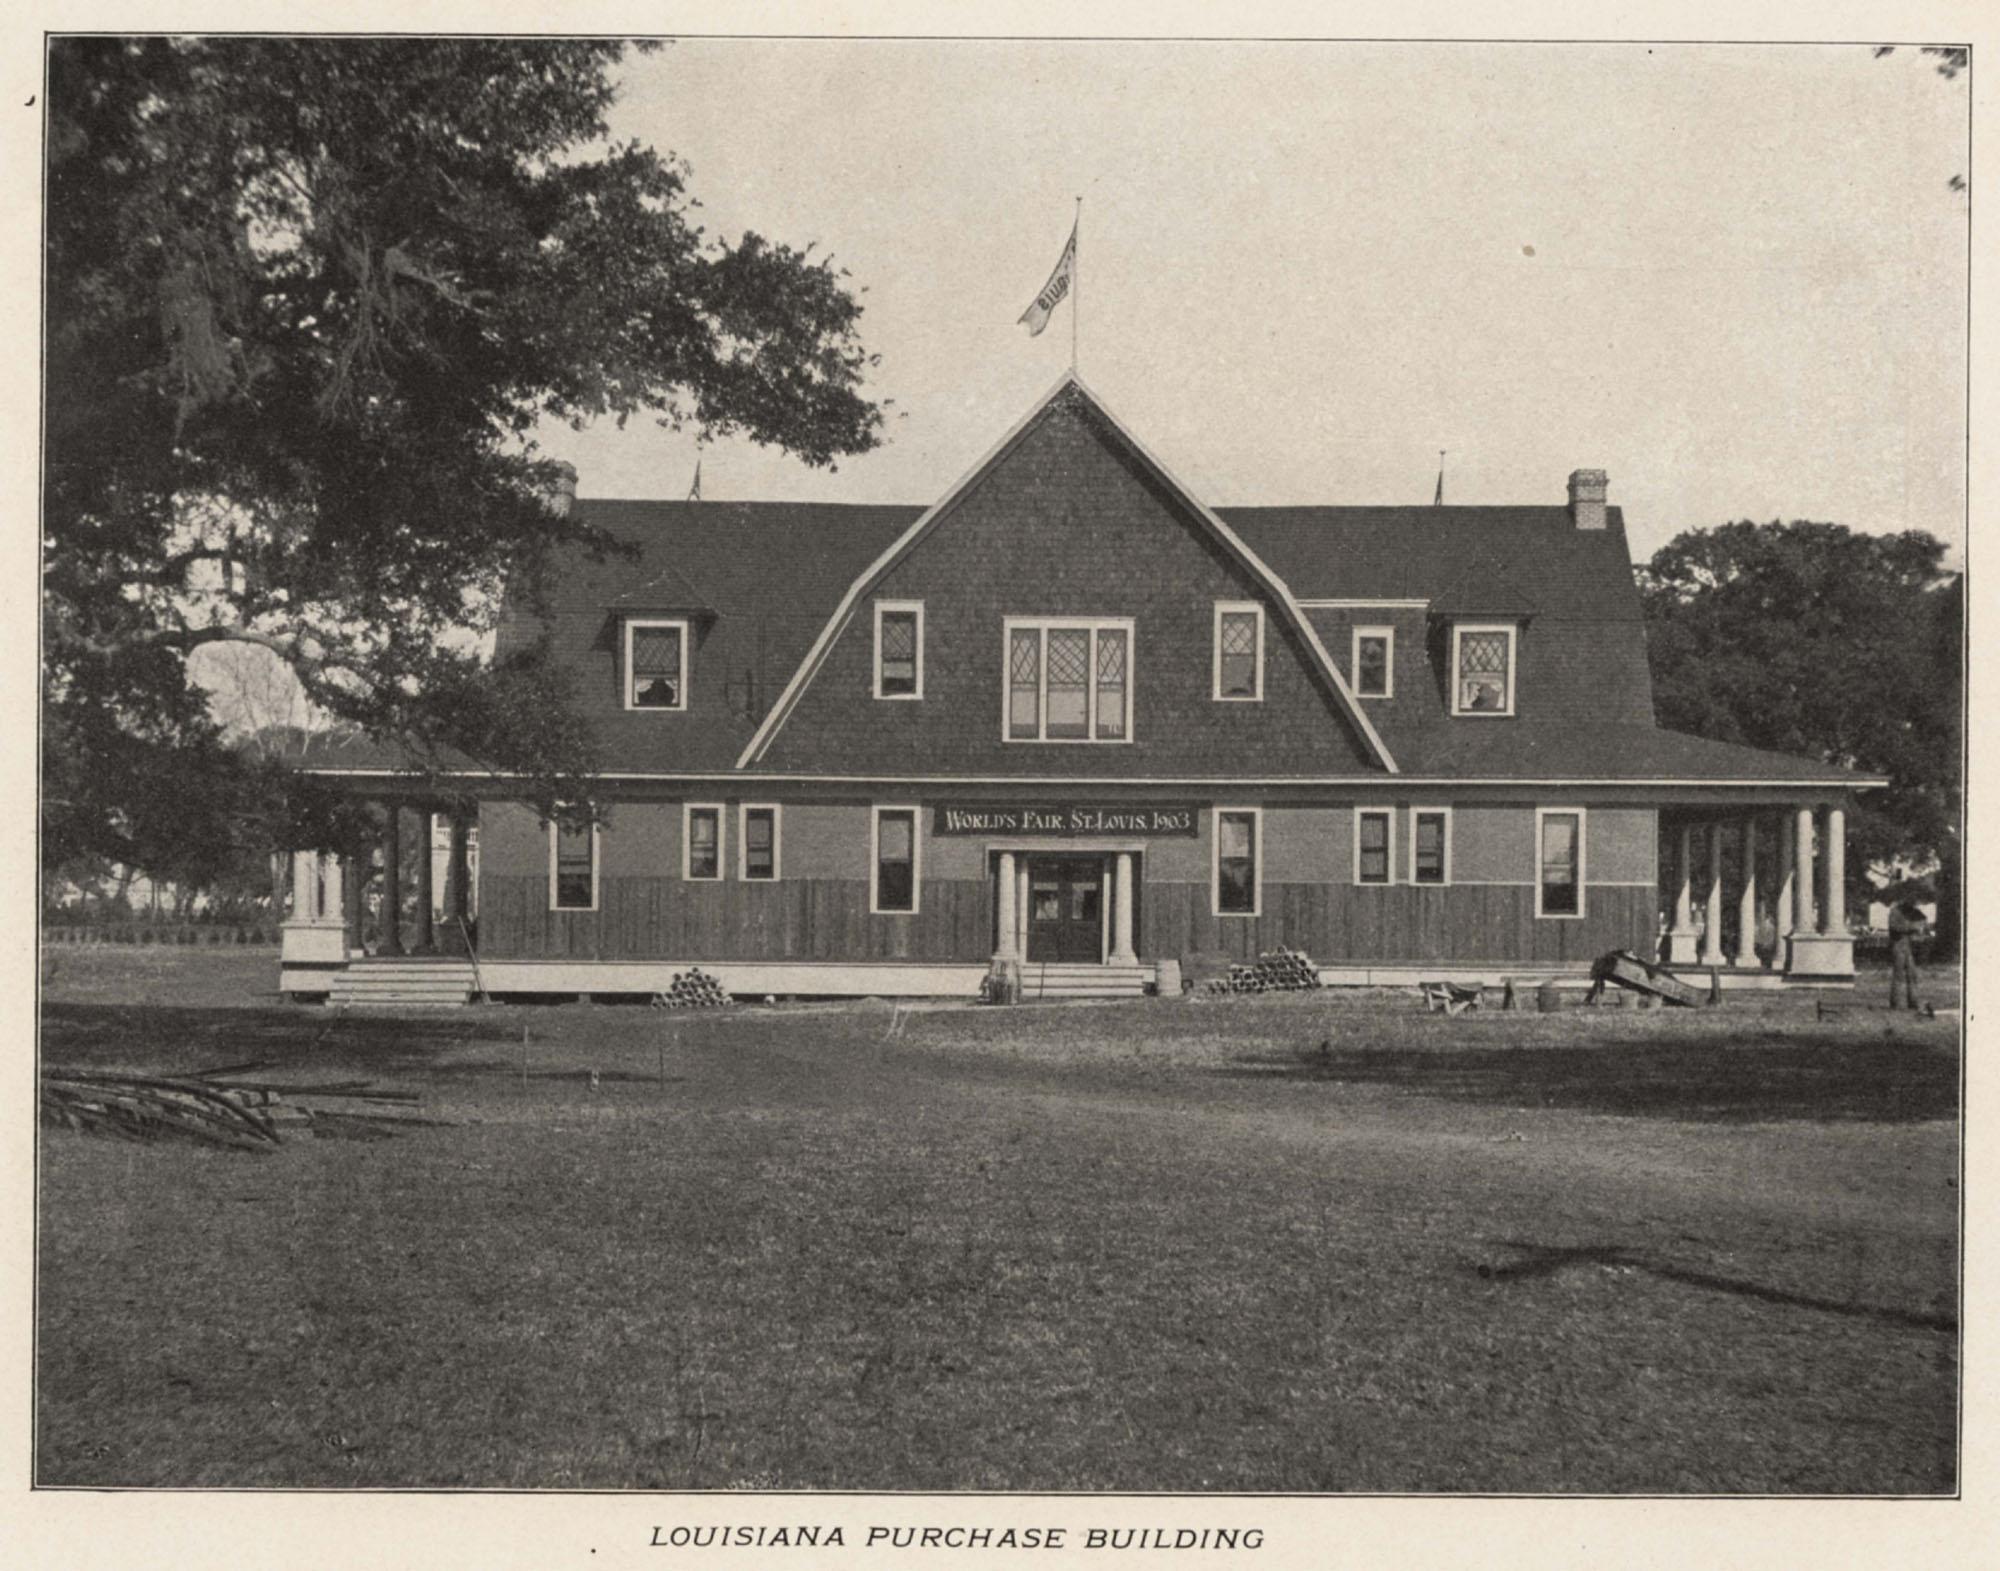 Louisiana Purchase Building